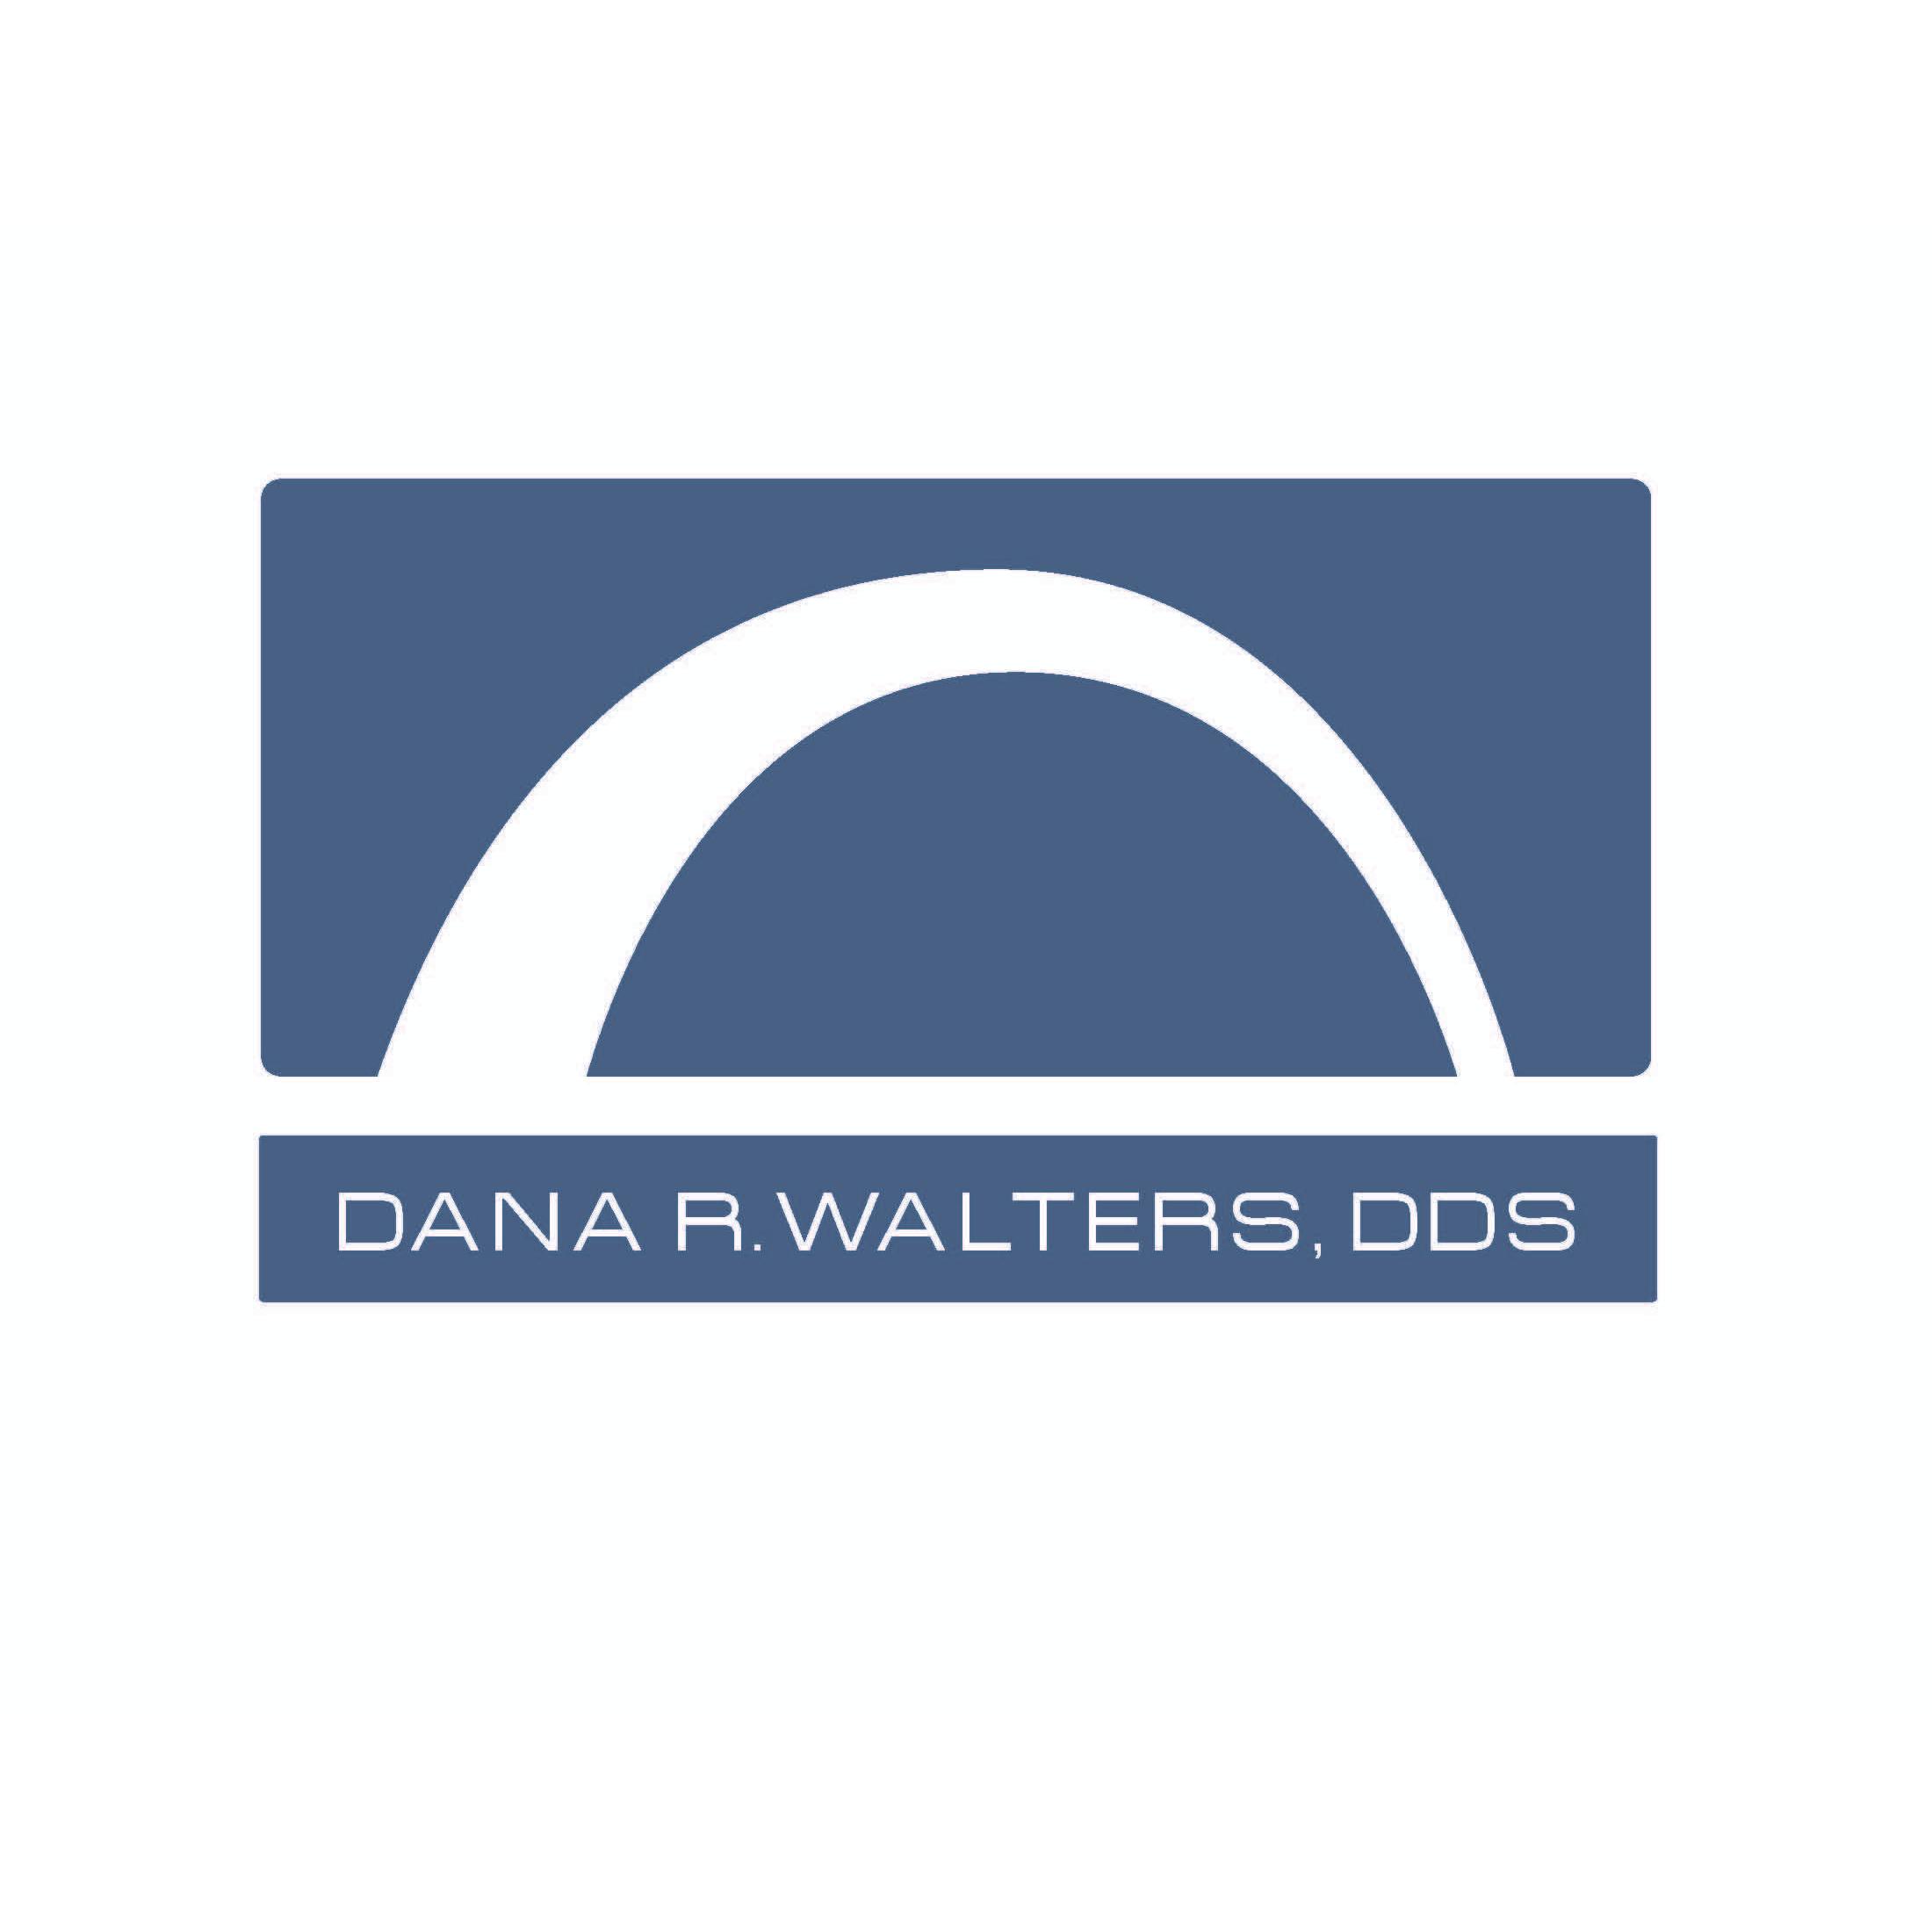 Dana R. Walters, DDS